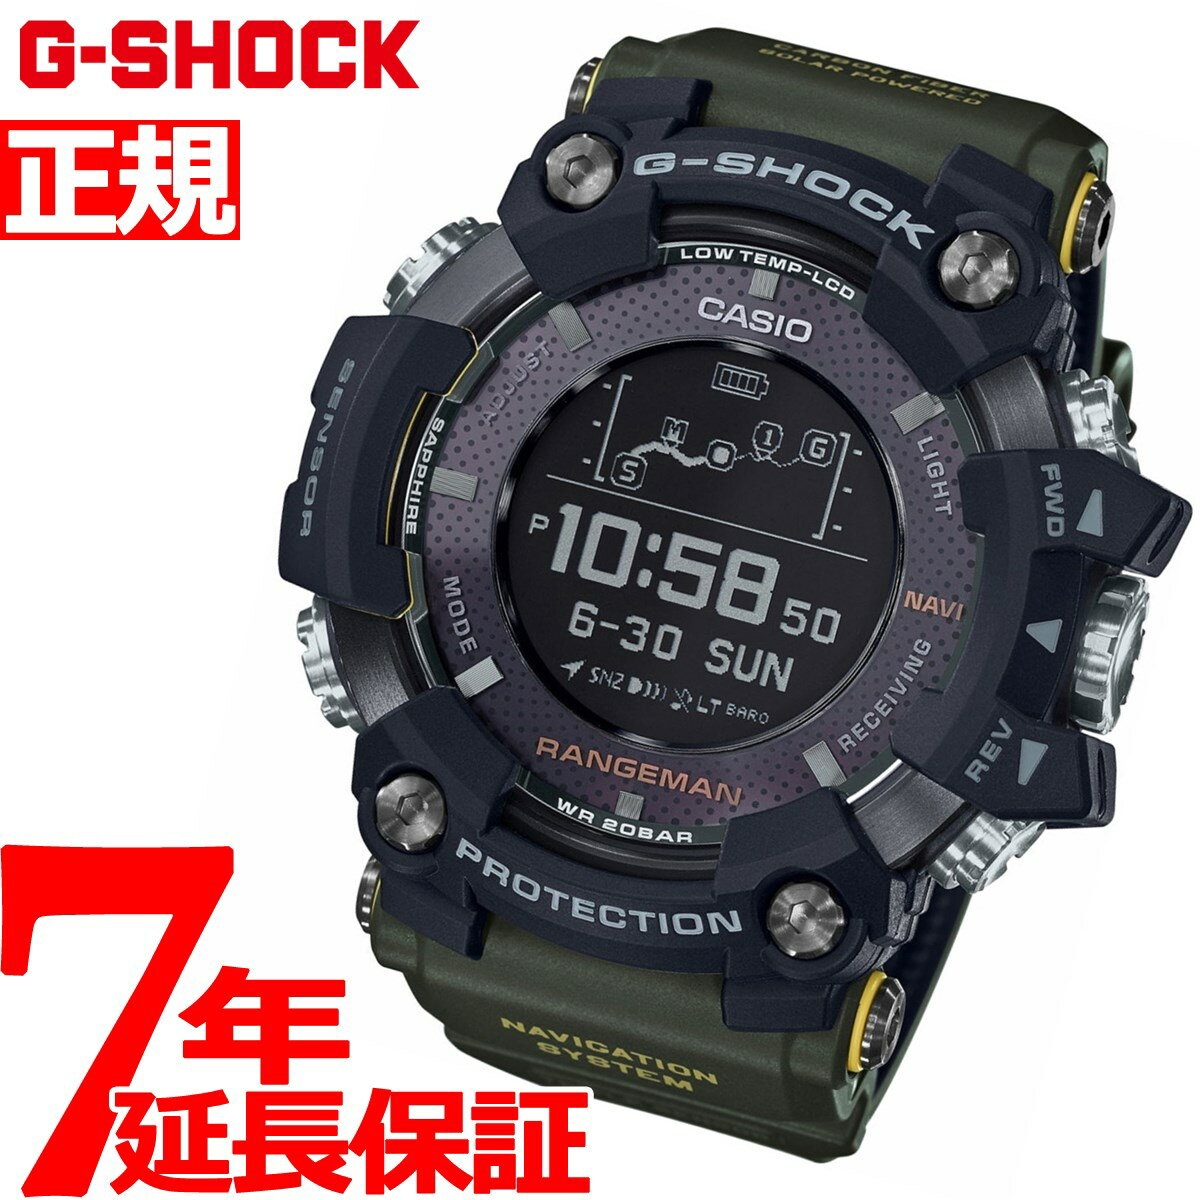 G-SHOCK GPS 電波 ソーラー 電波時計 カシオ Gショック レンジマン CASIO RANGEMAN Bluetooth搭載 腕時計 メンズ GPR-B1000-1BJR【2018 新作】【あす楽対応】【即納可】